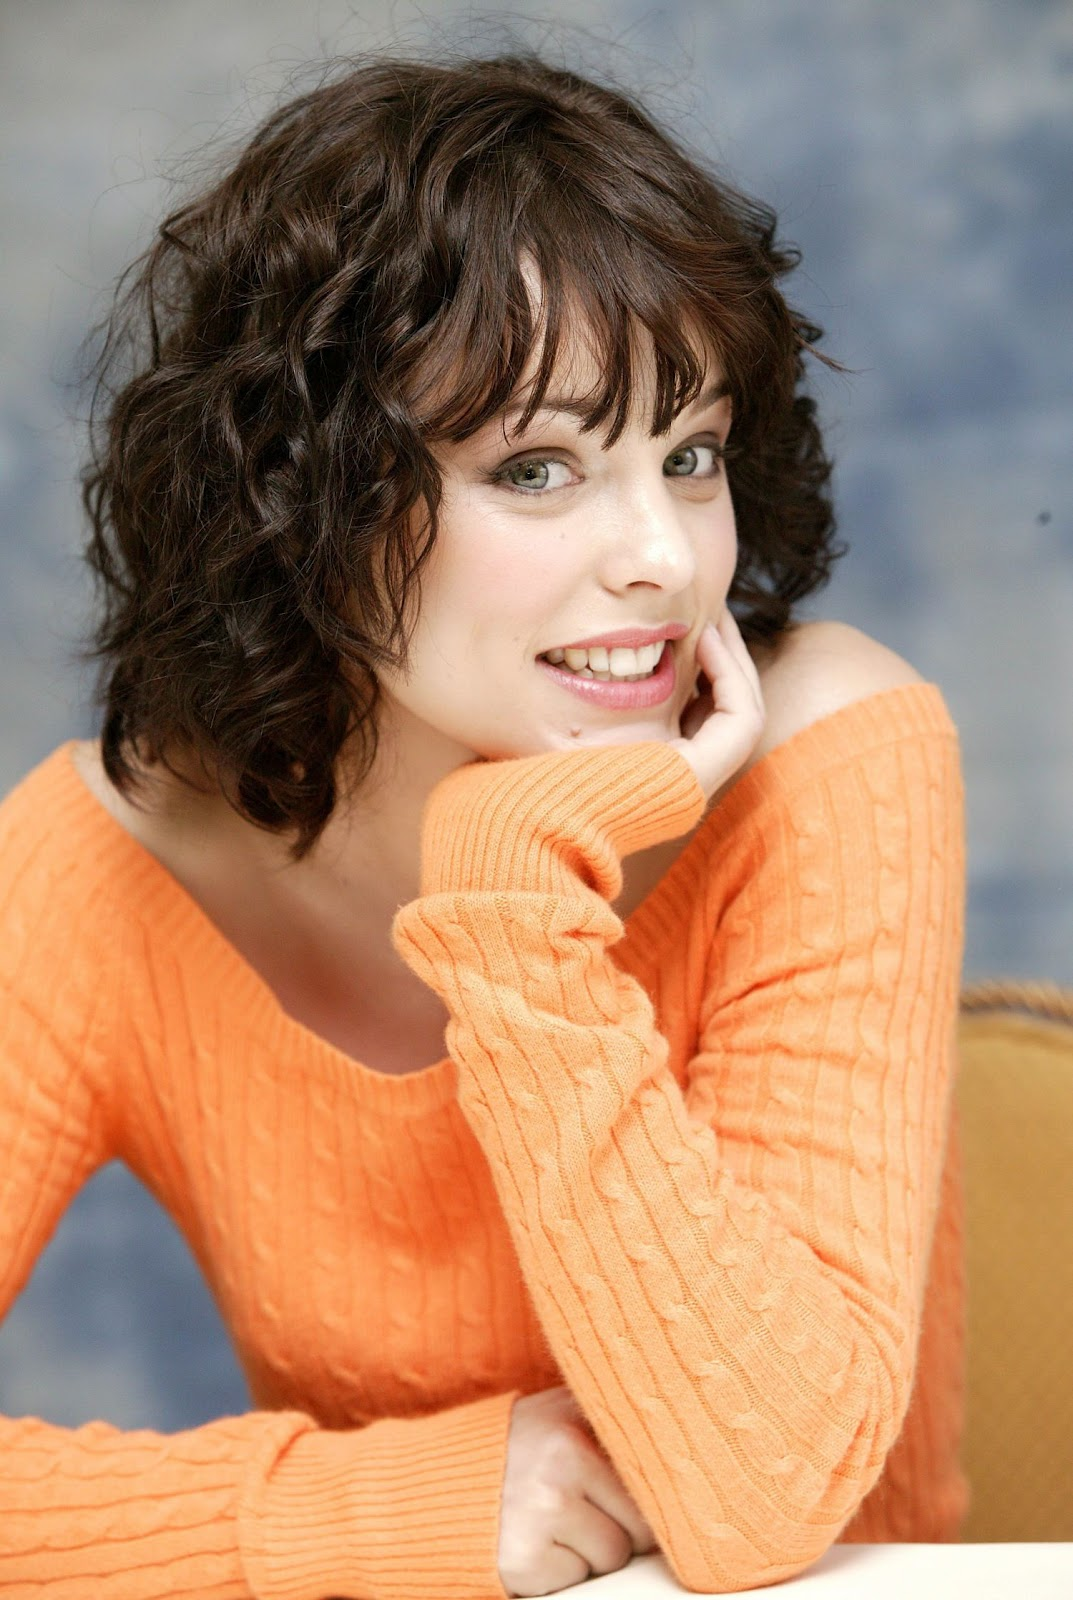 Rachel McAdams pictures gallery 22  Film Actresses